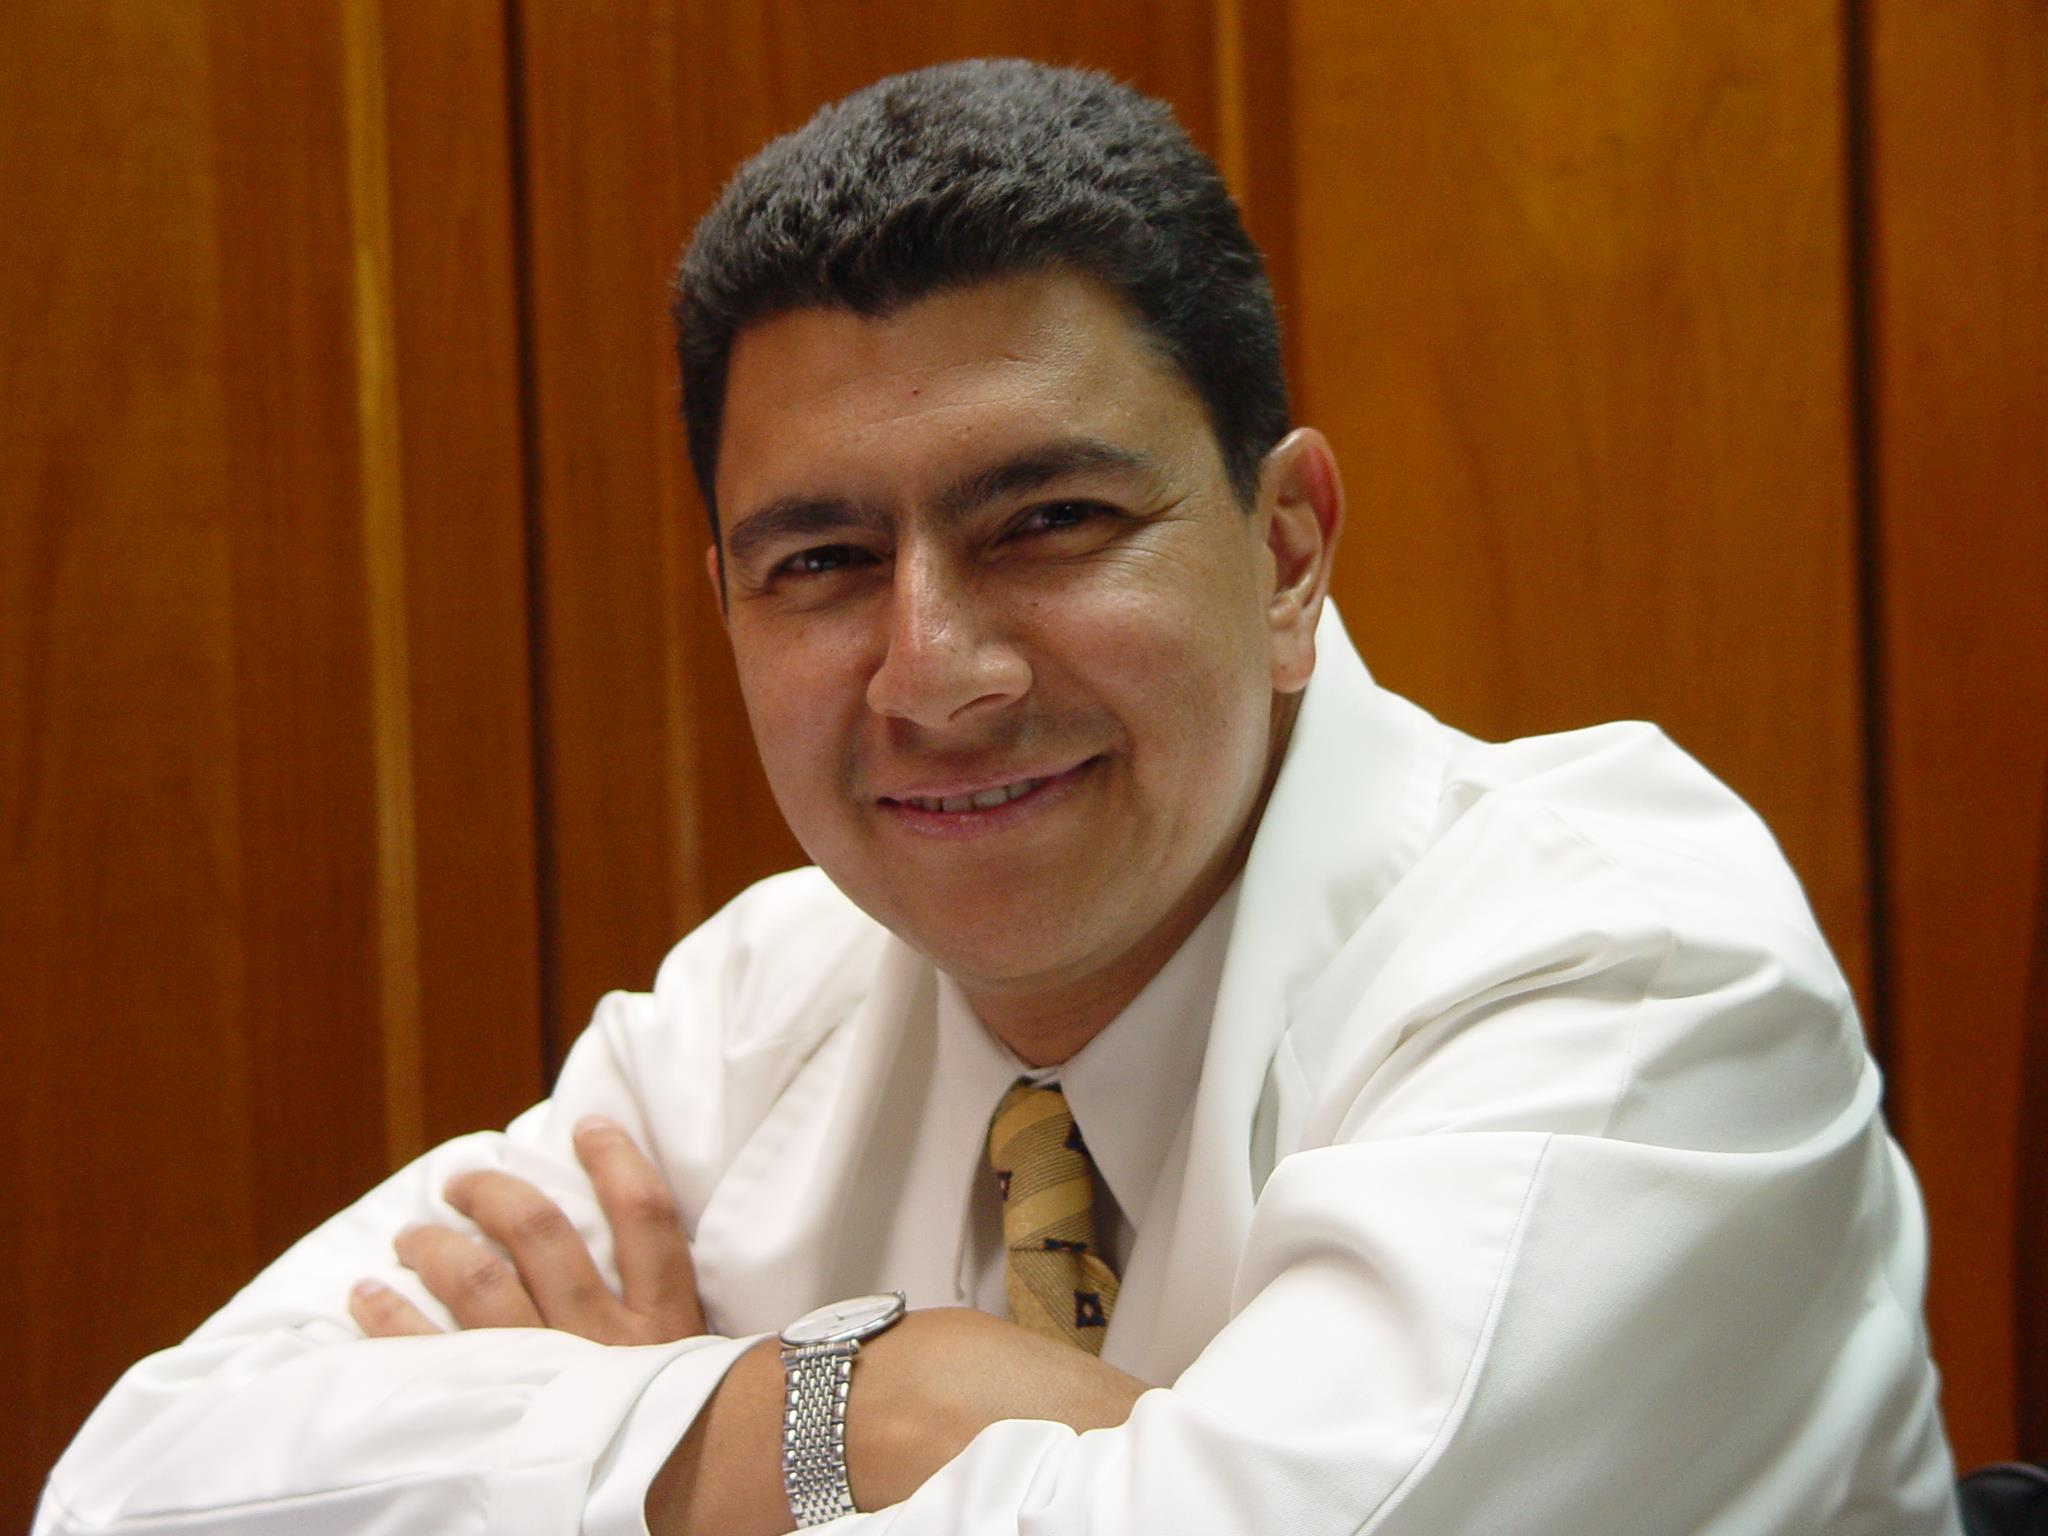 Jose Luis Monroy Camacho